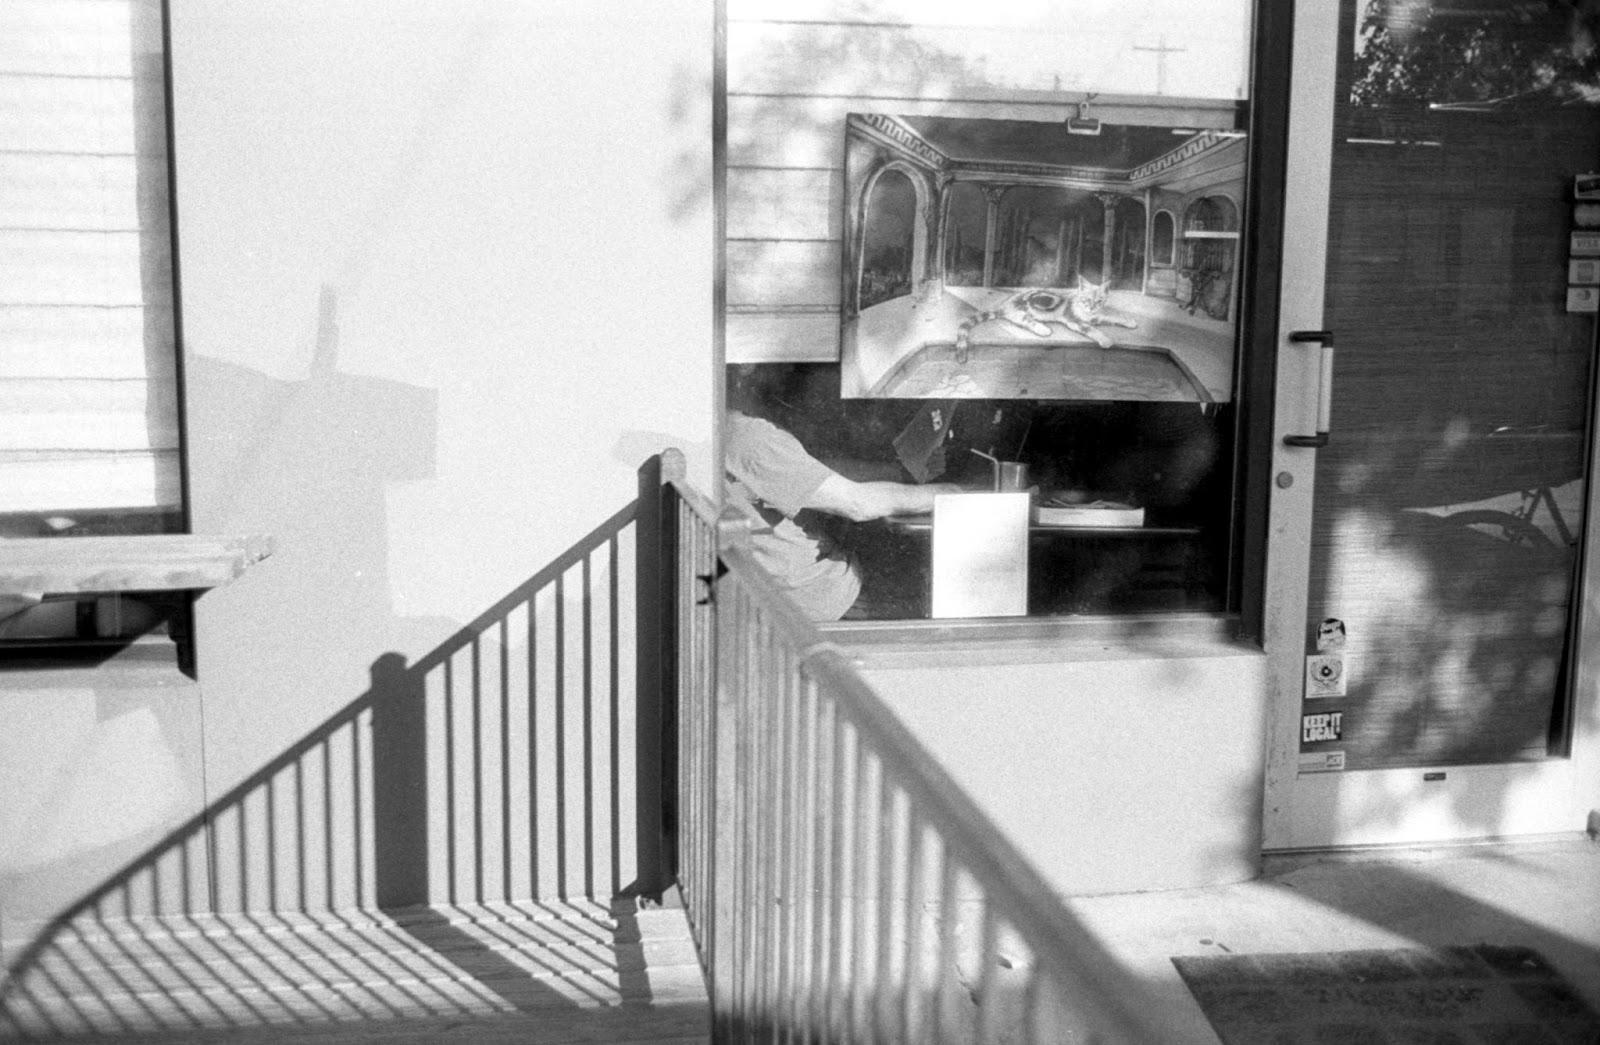 Shadows outside La Tazza Fresca on Guadalupe Street